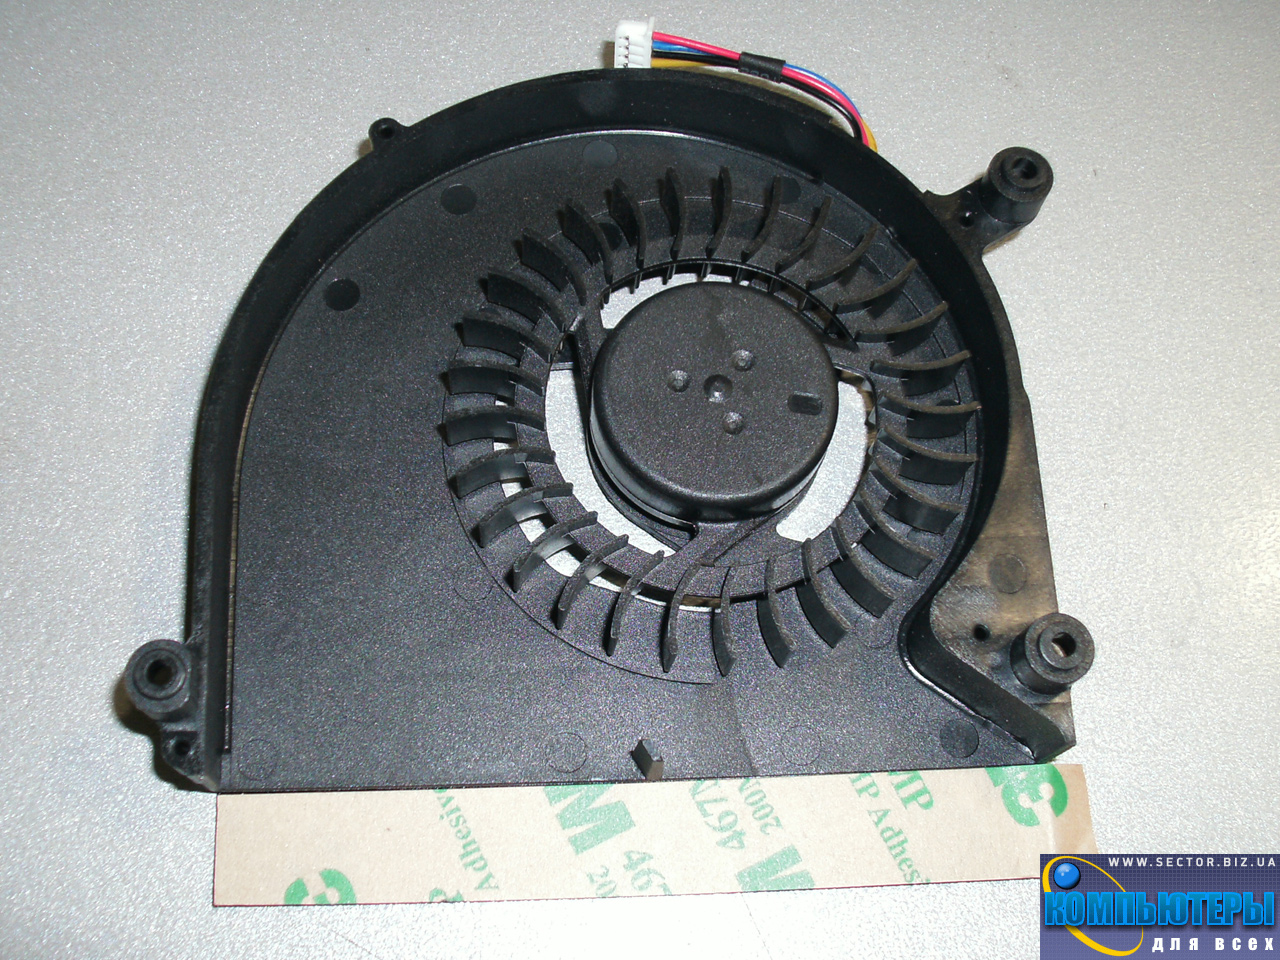 Кулер к ноутбуку Asus X5D X5DI X5DC X5DAF X5 K60 K61IC K70 K70AB K70C p/n: KDB0705HB-9K57. Фото № 4.